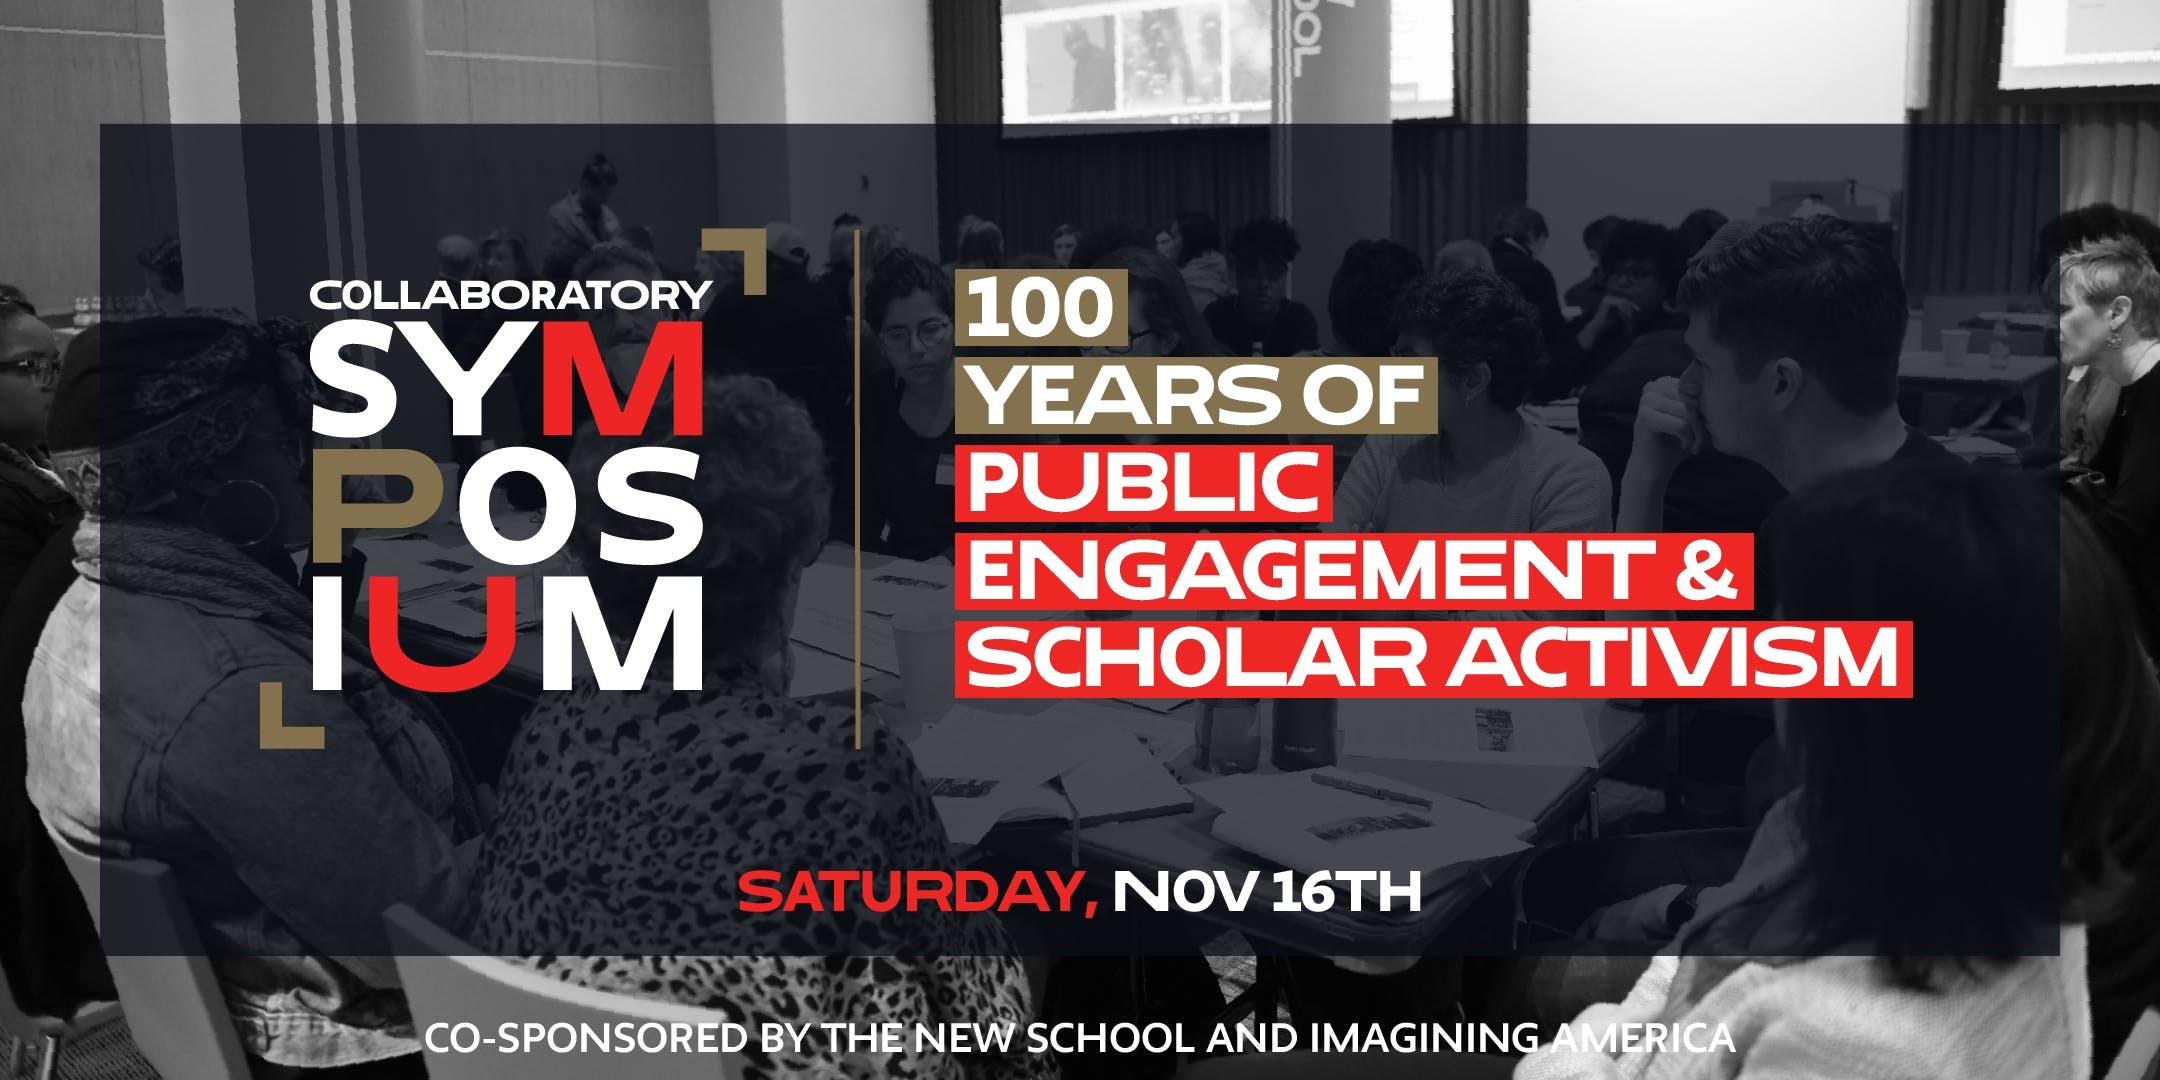 Collaboratory Centennial Symposium 100 Years of Scholar Activism